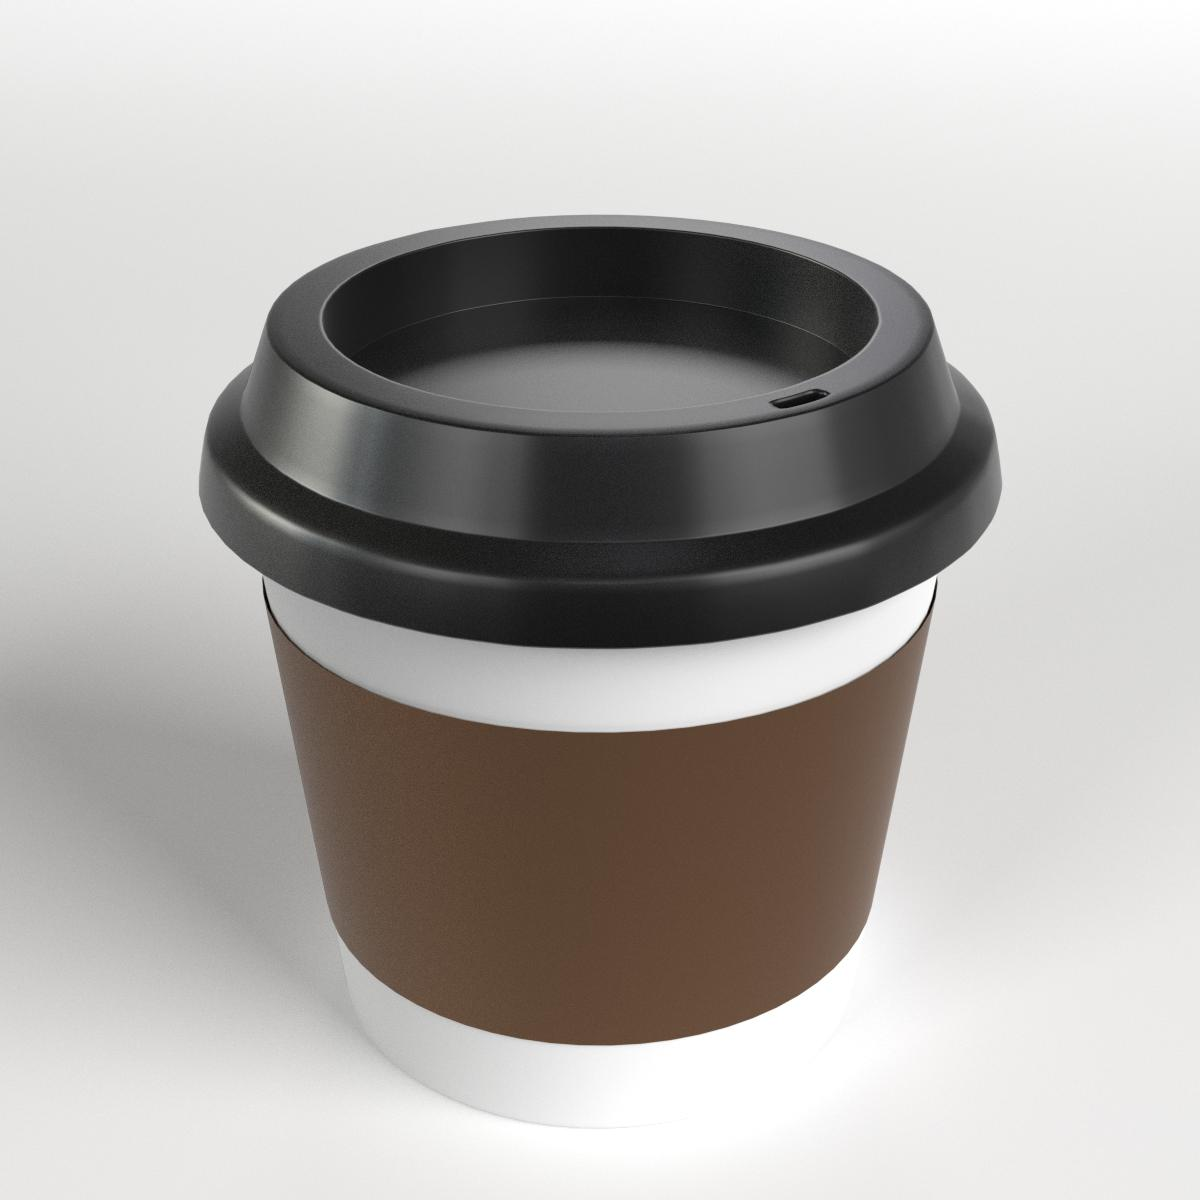 Small Coffe Cups Castrophotos Keep Cup Doppio 8oz 227ml Coffee Travel Mug By Francescomilanese 3docean